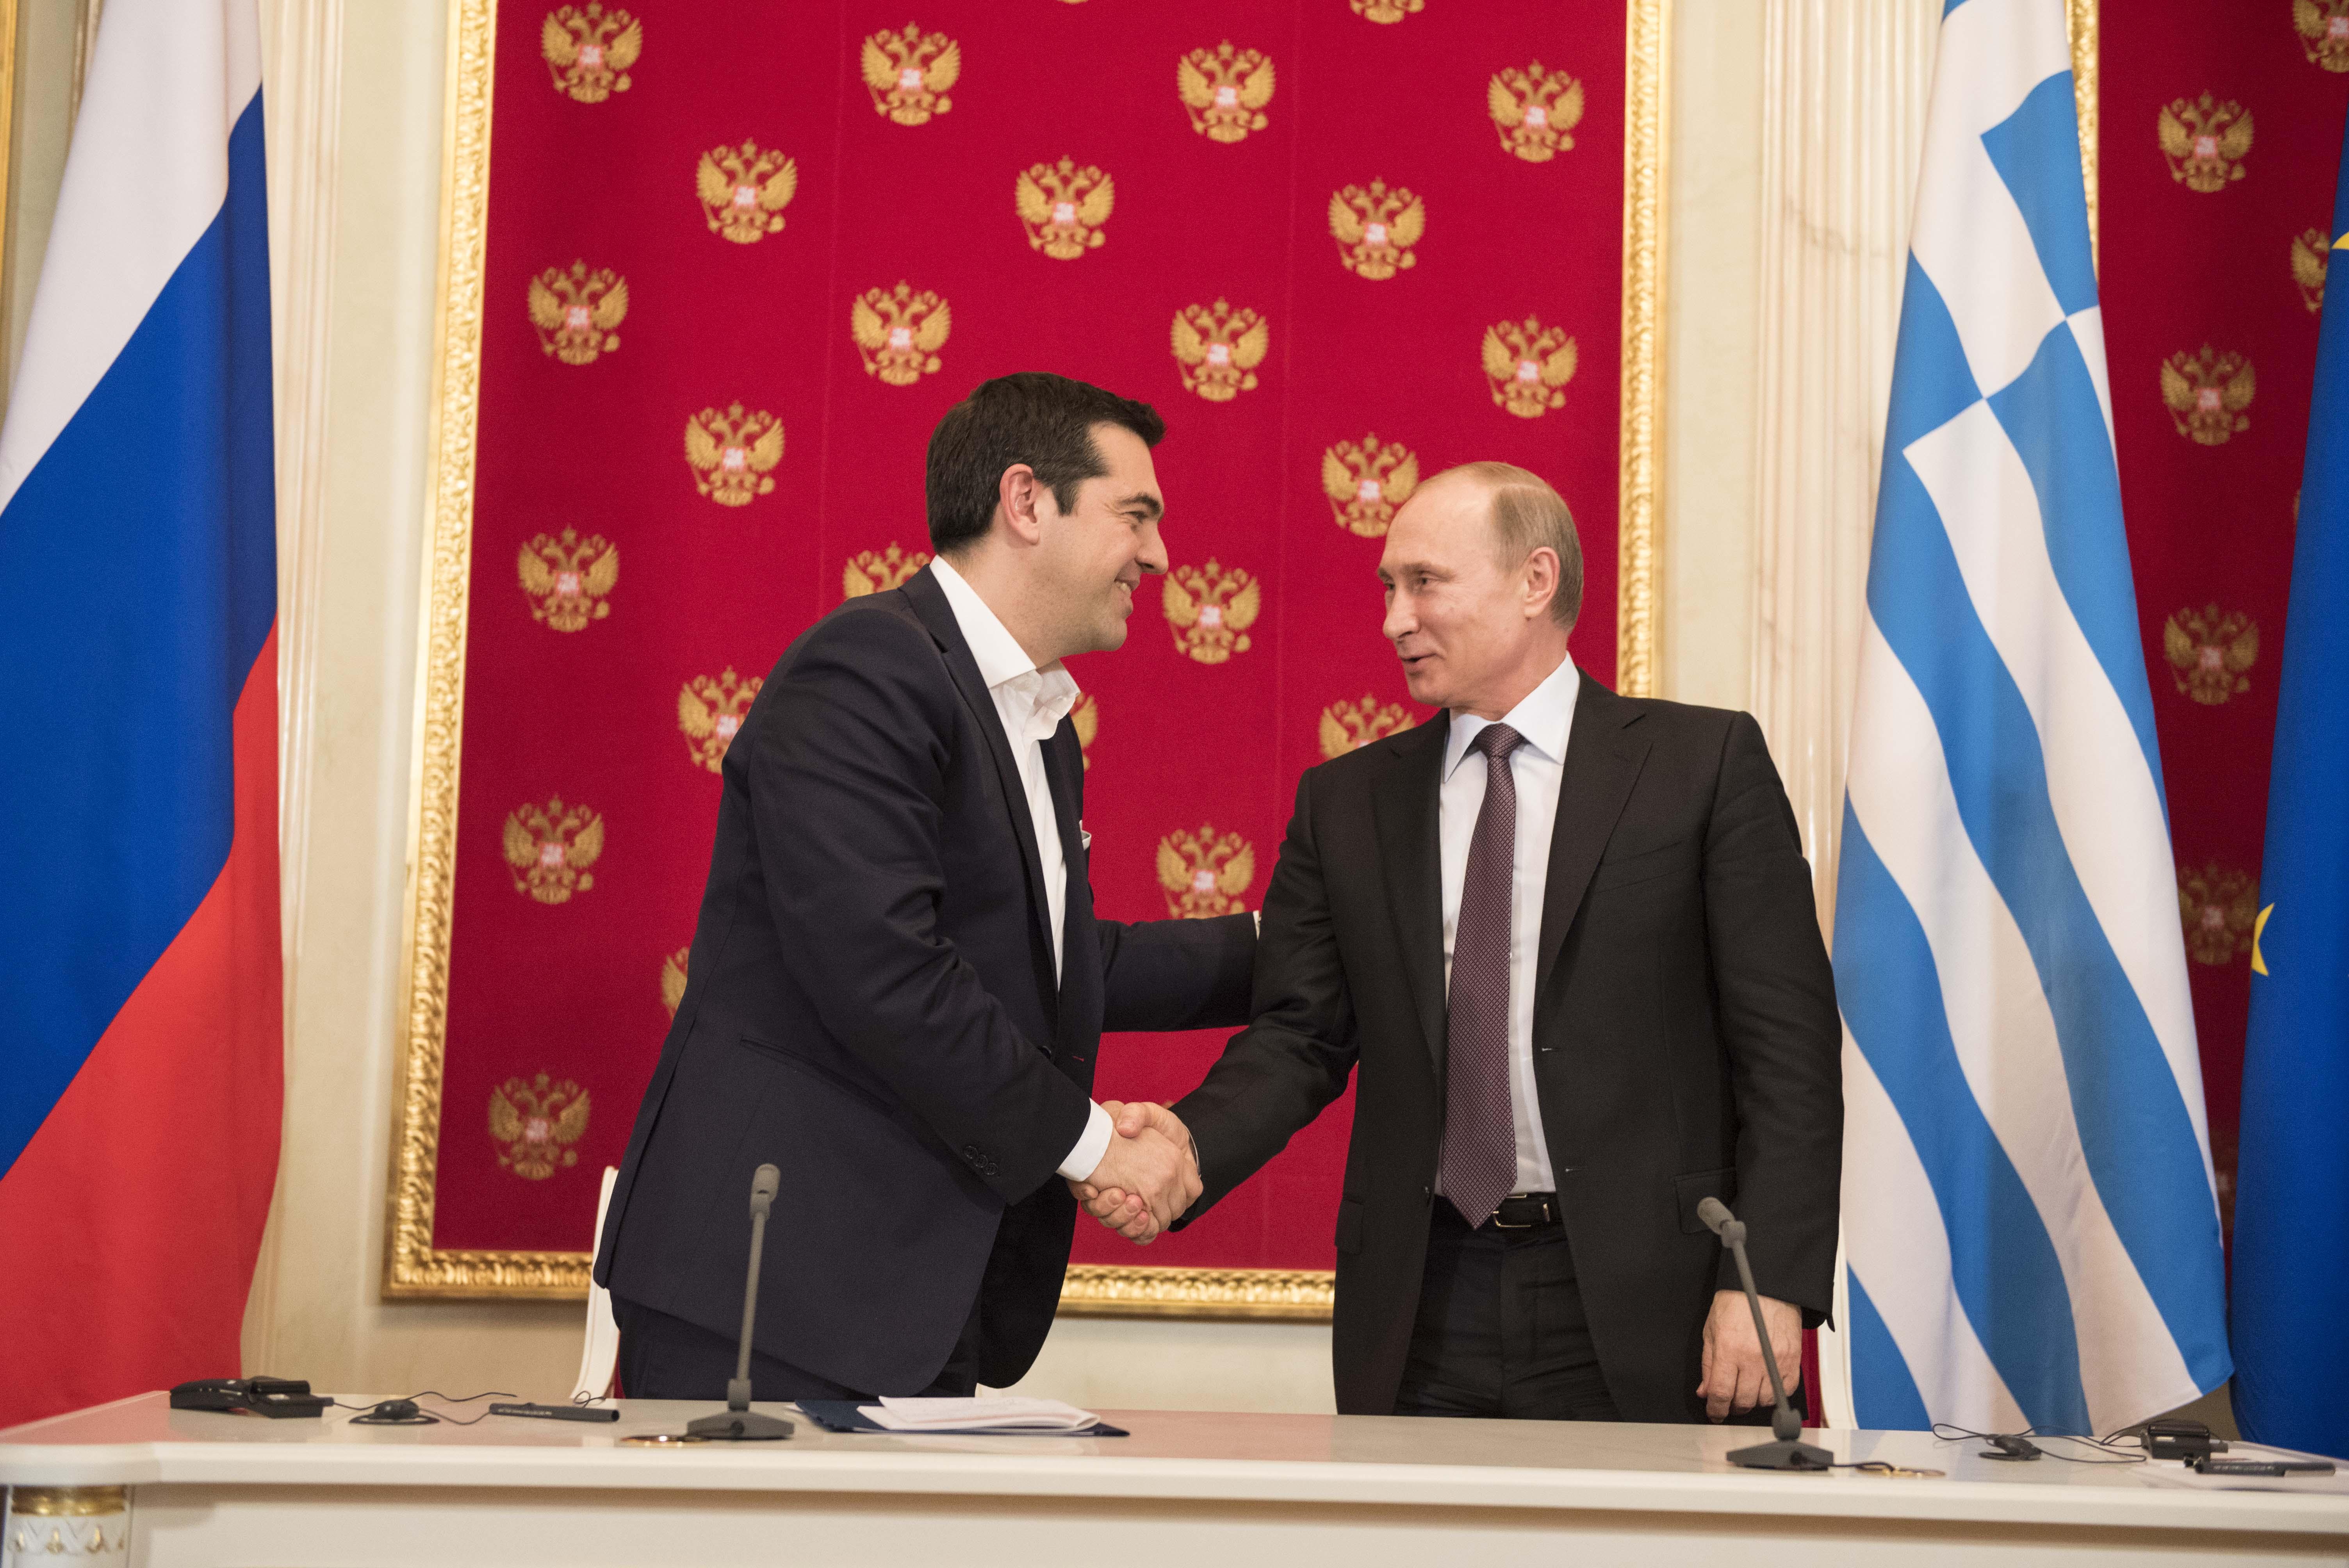 Greece-Russia relations enter new era